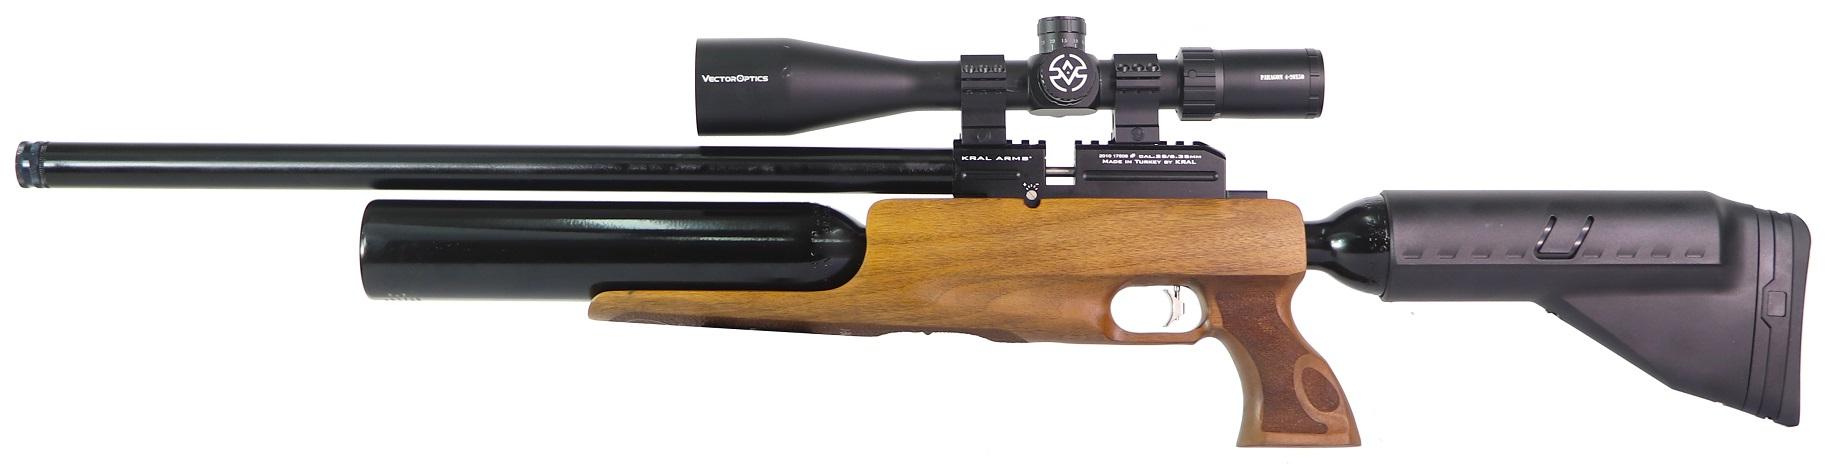 Carabina de Pressão Kral Arms PCP PUNCHER BIGMAX Wood 6.35mm